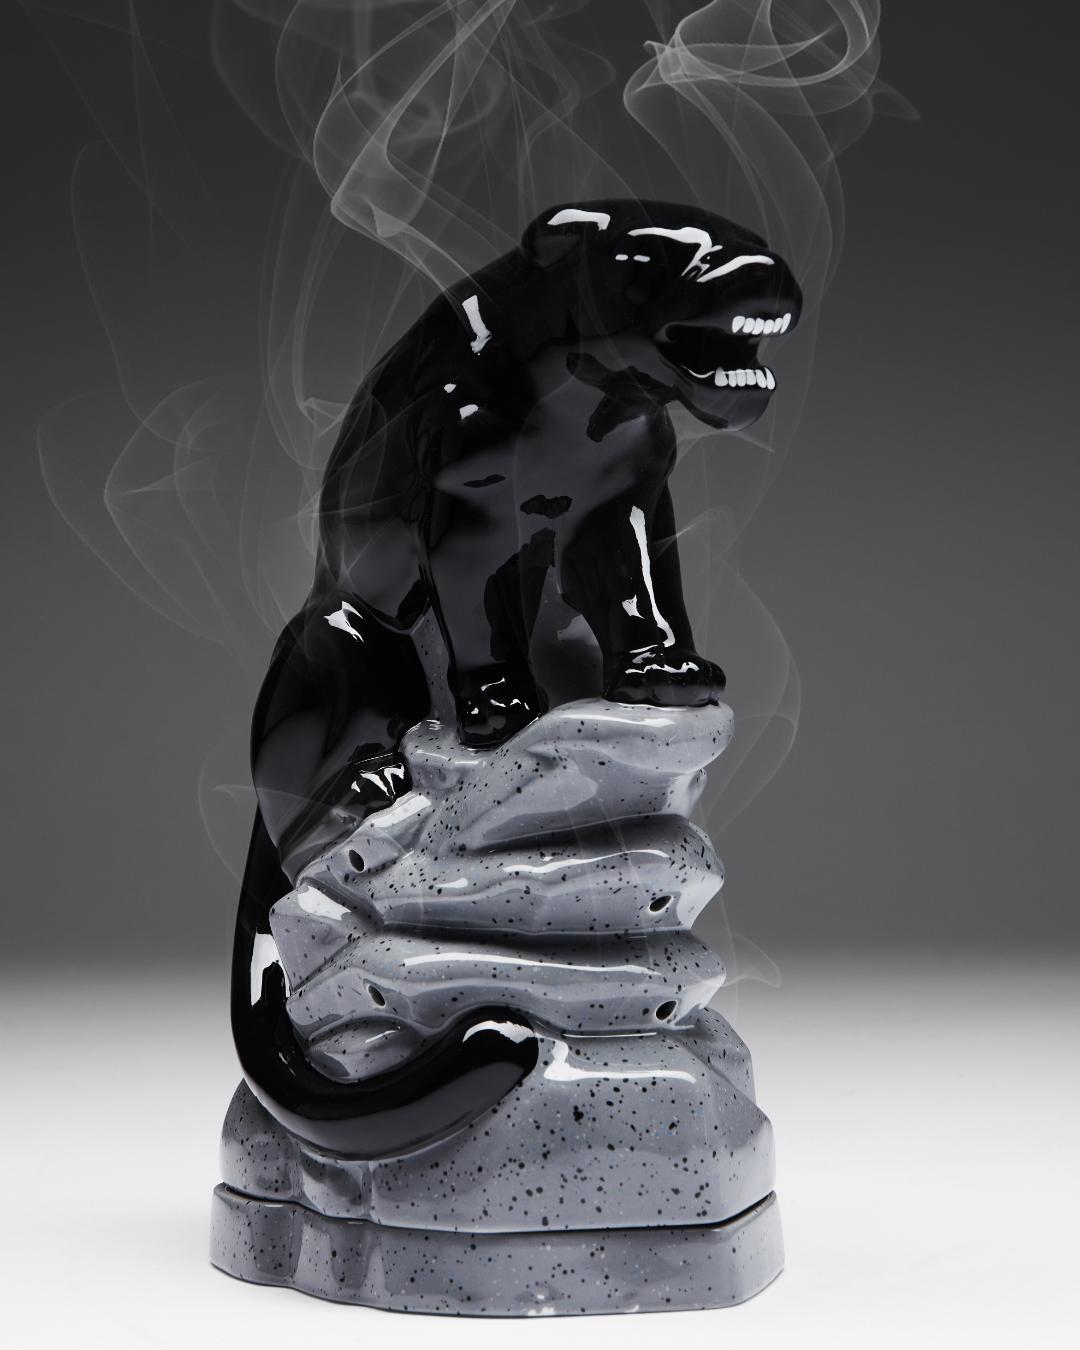 burner negru panther)